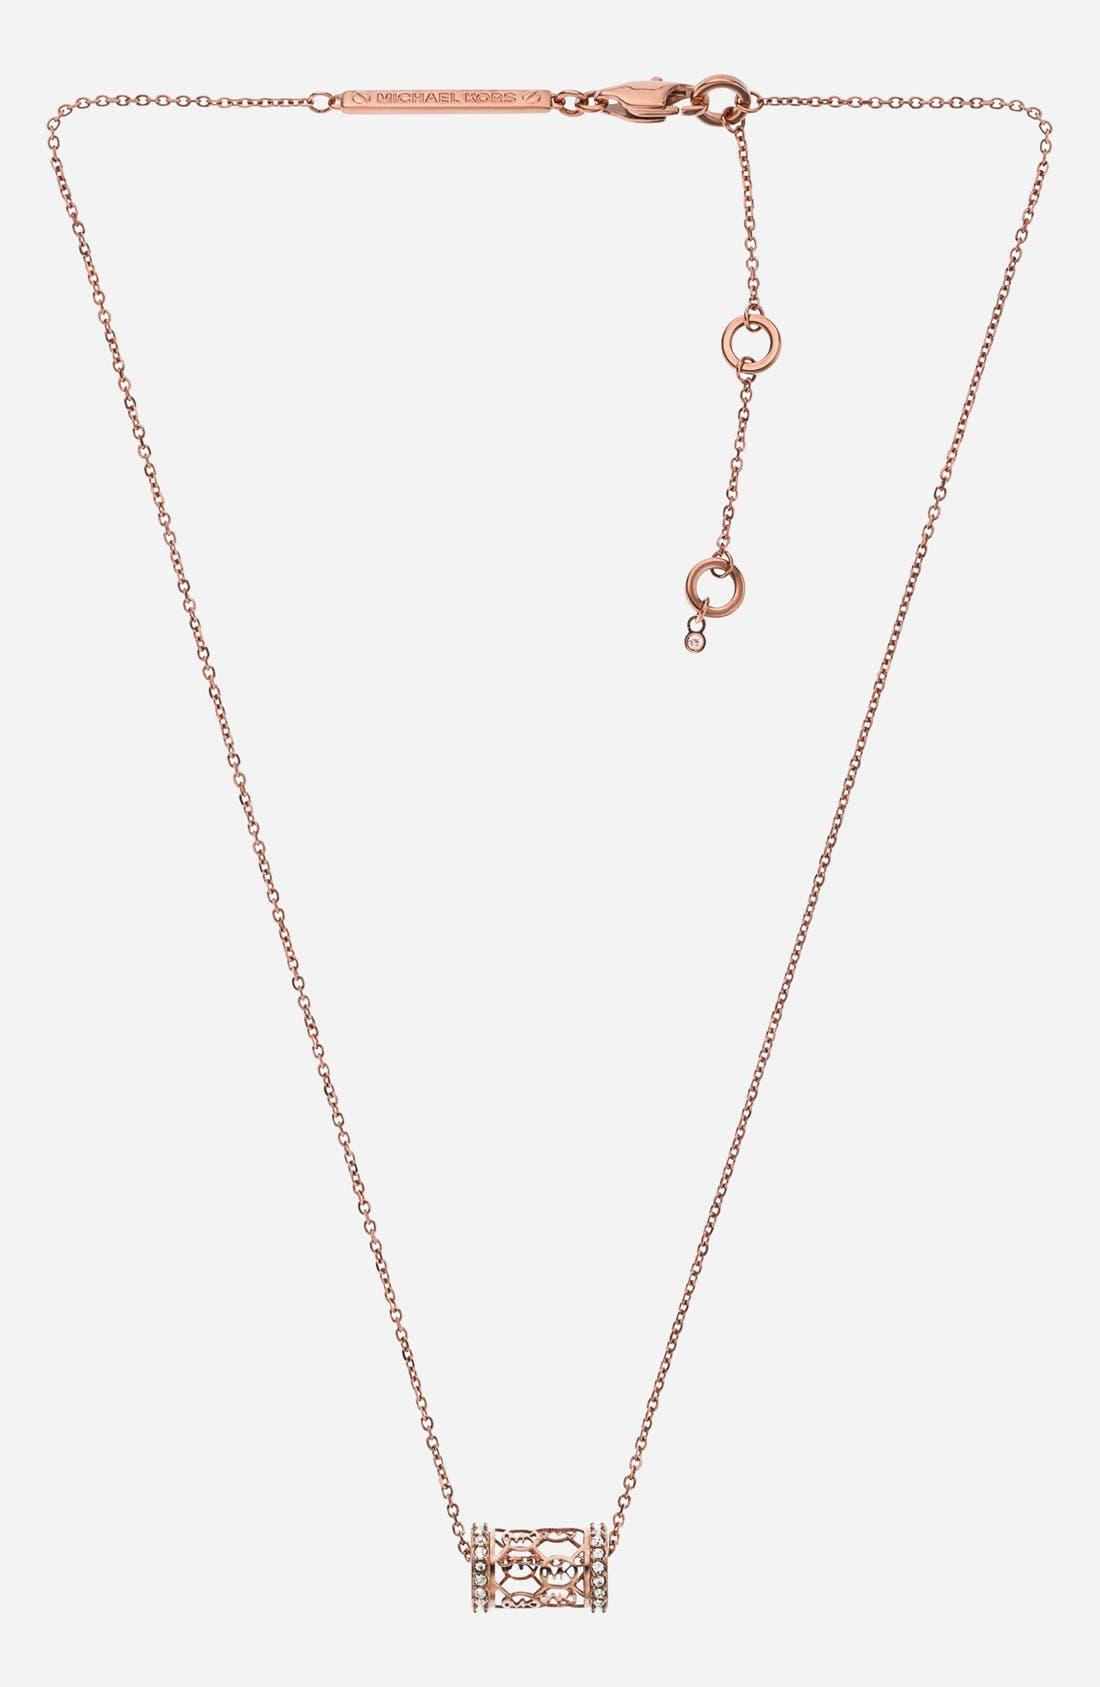 Main Image - Michael Kors 'Monogram' Pendant Necklace